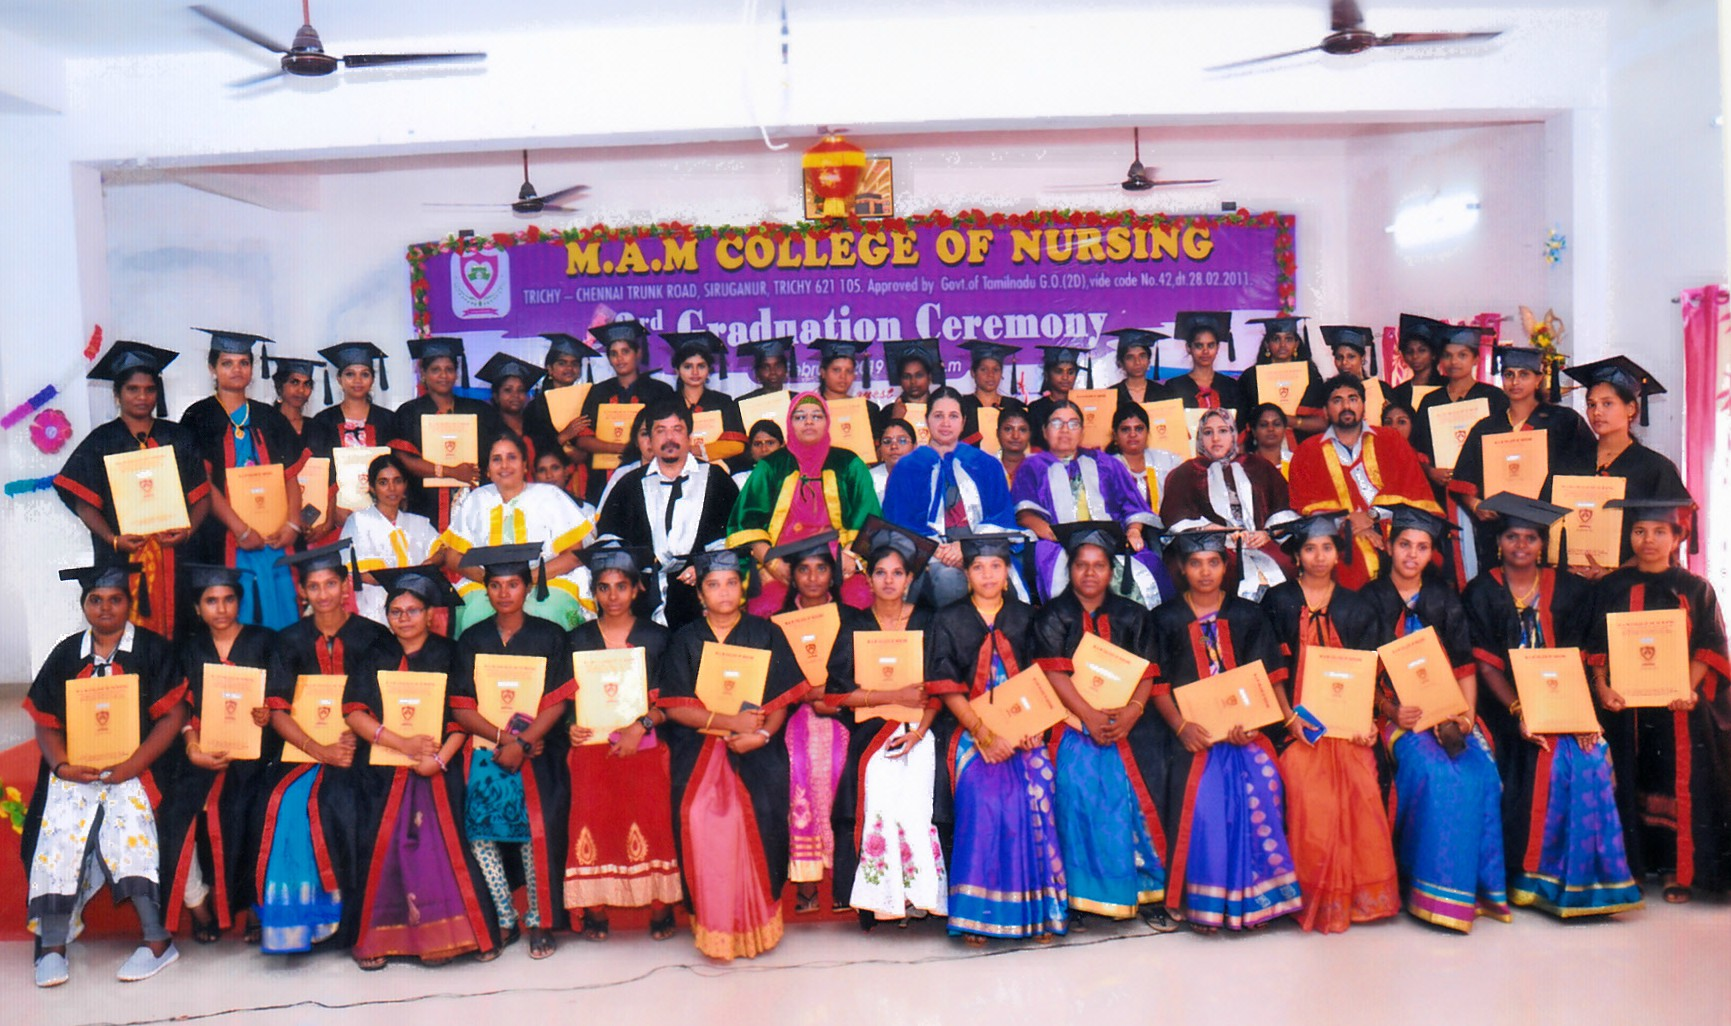 M.A.M College of Nursing, Tiruchirappalli Image